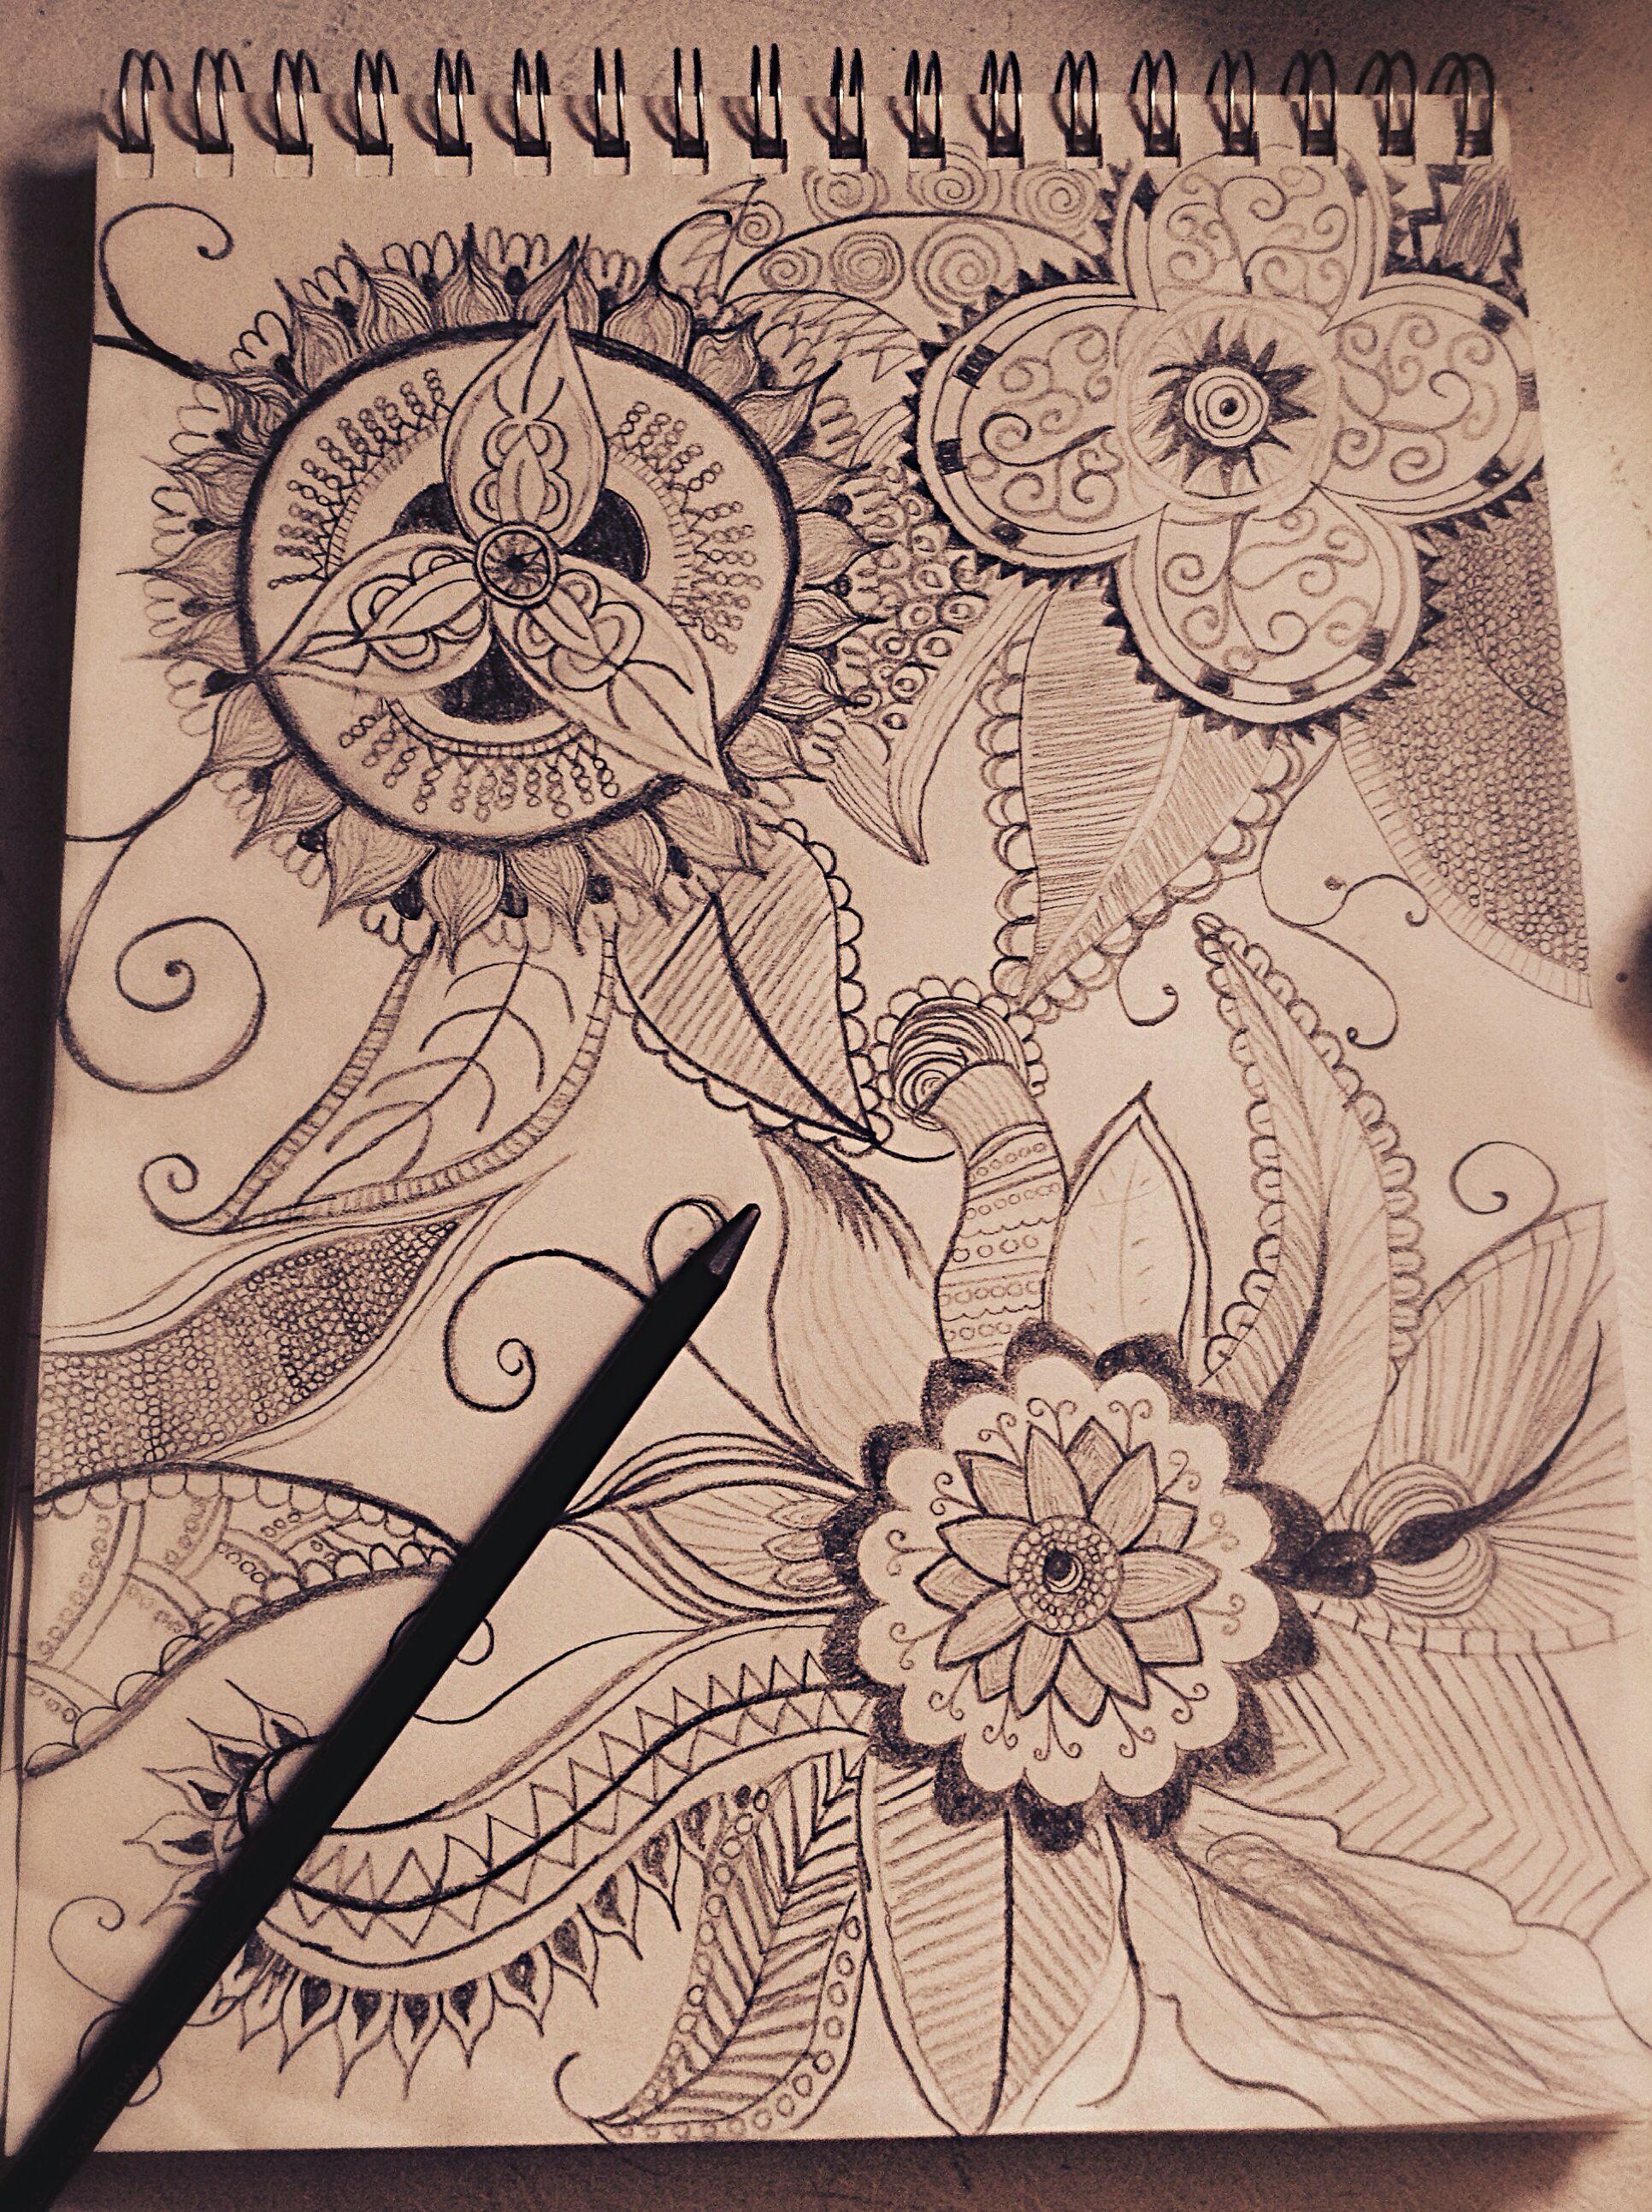 Aztec Flower Pattern Creativity Point. Drawings